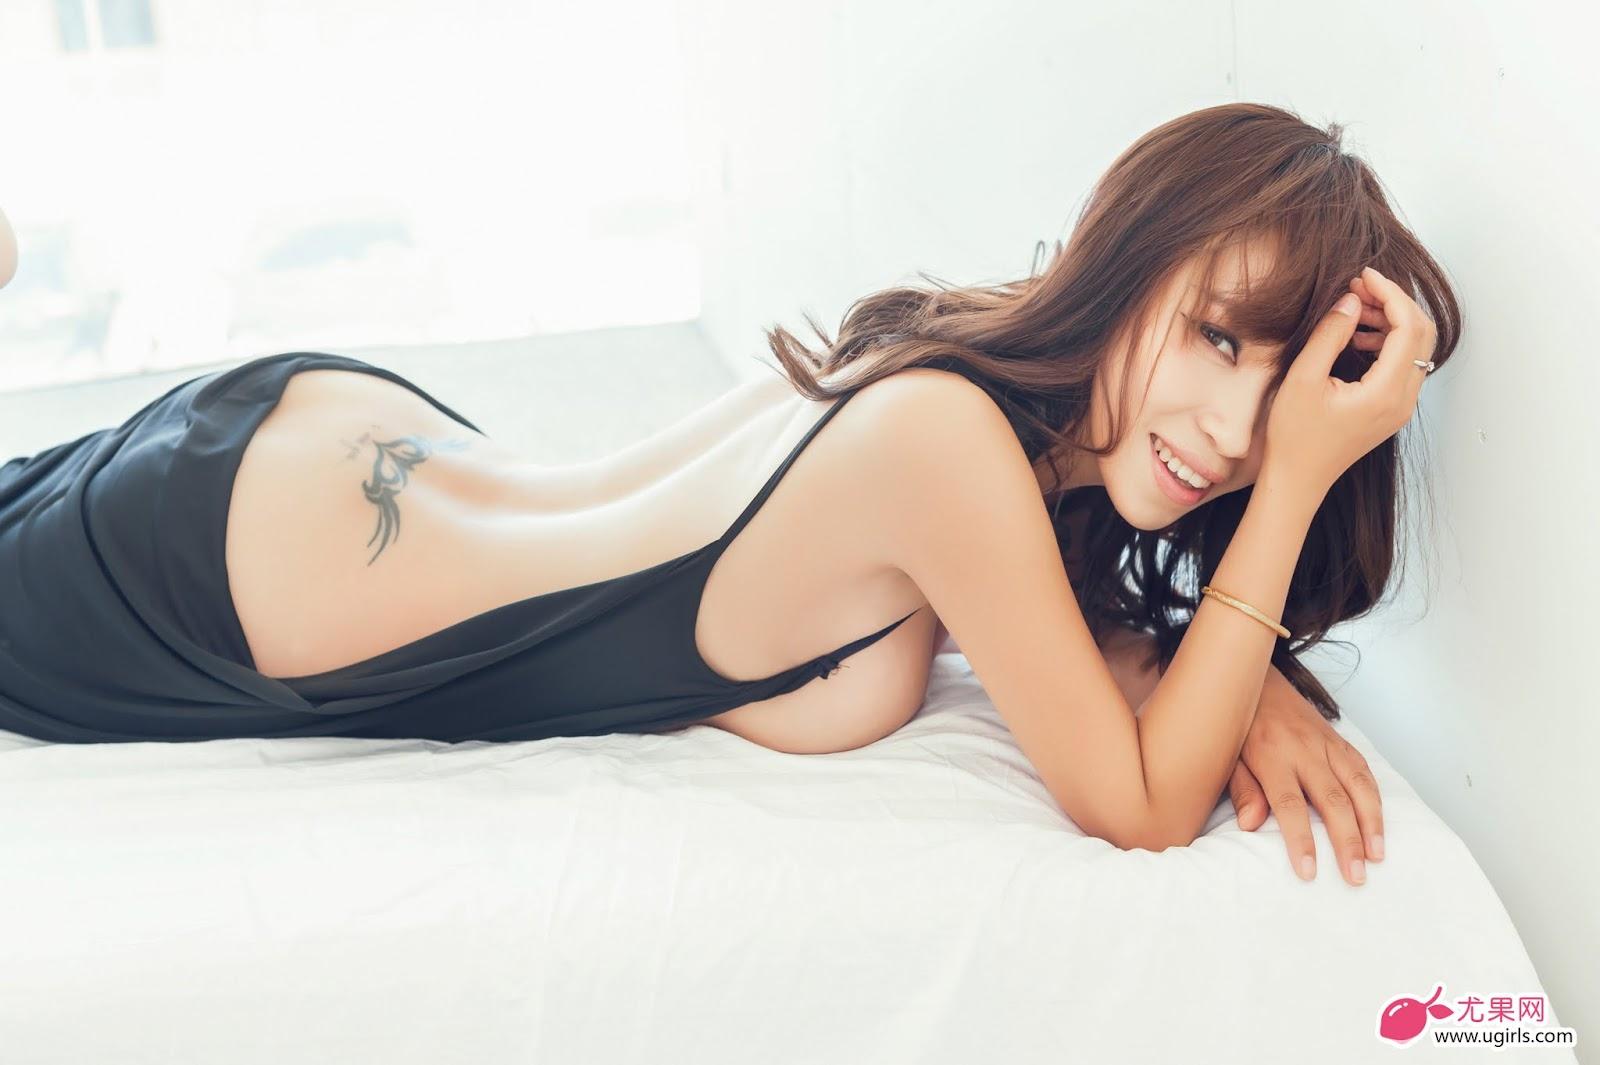 DLS 0183 - Hot Girl Ugirls No.021 Model: 田依依